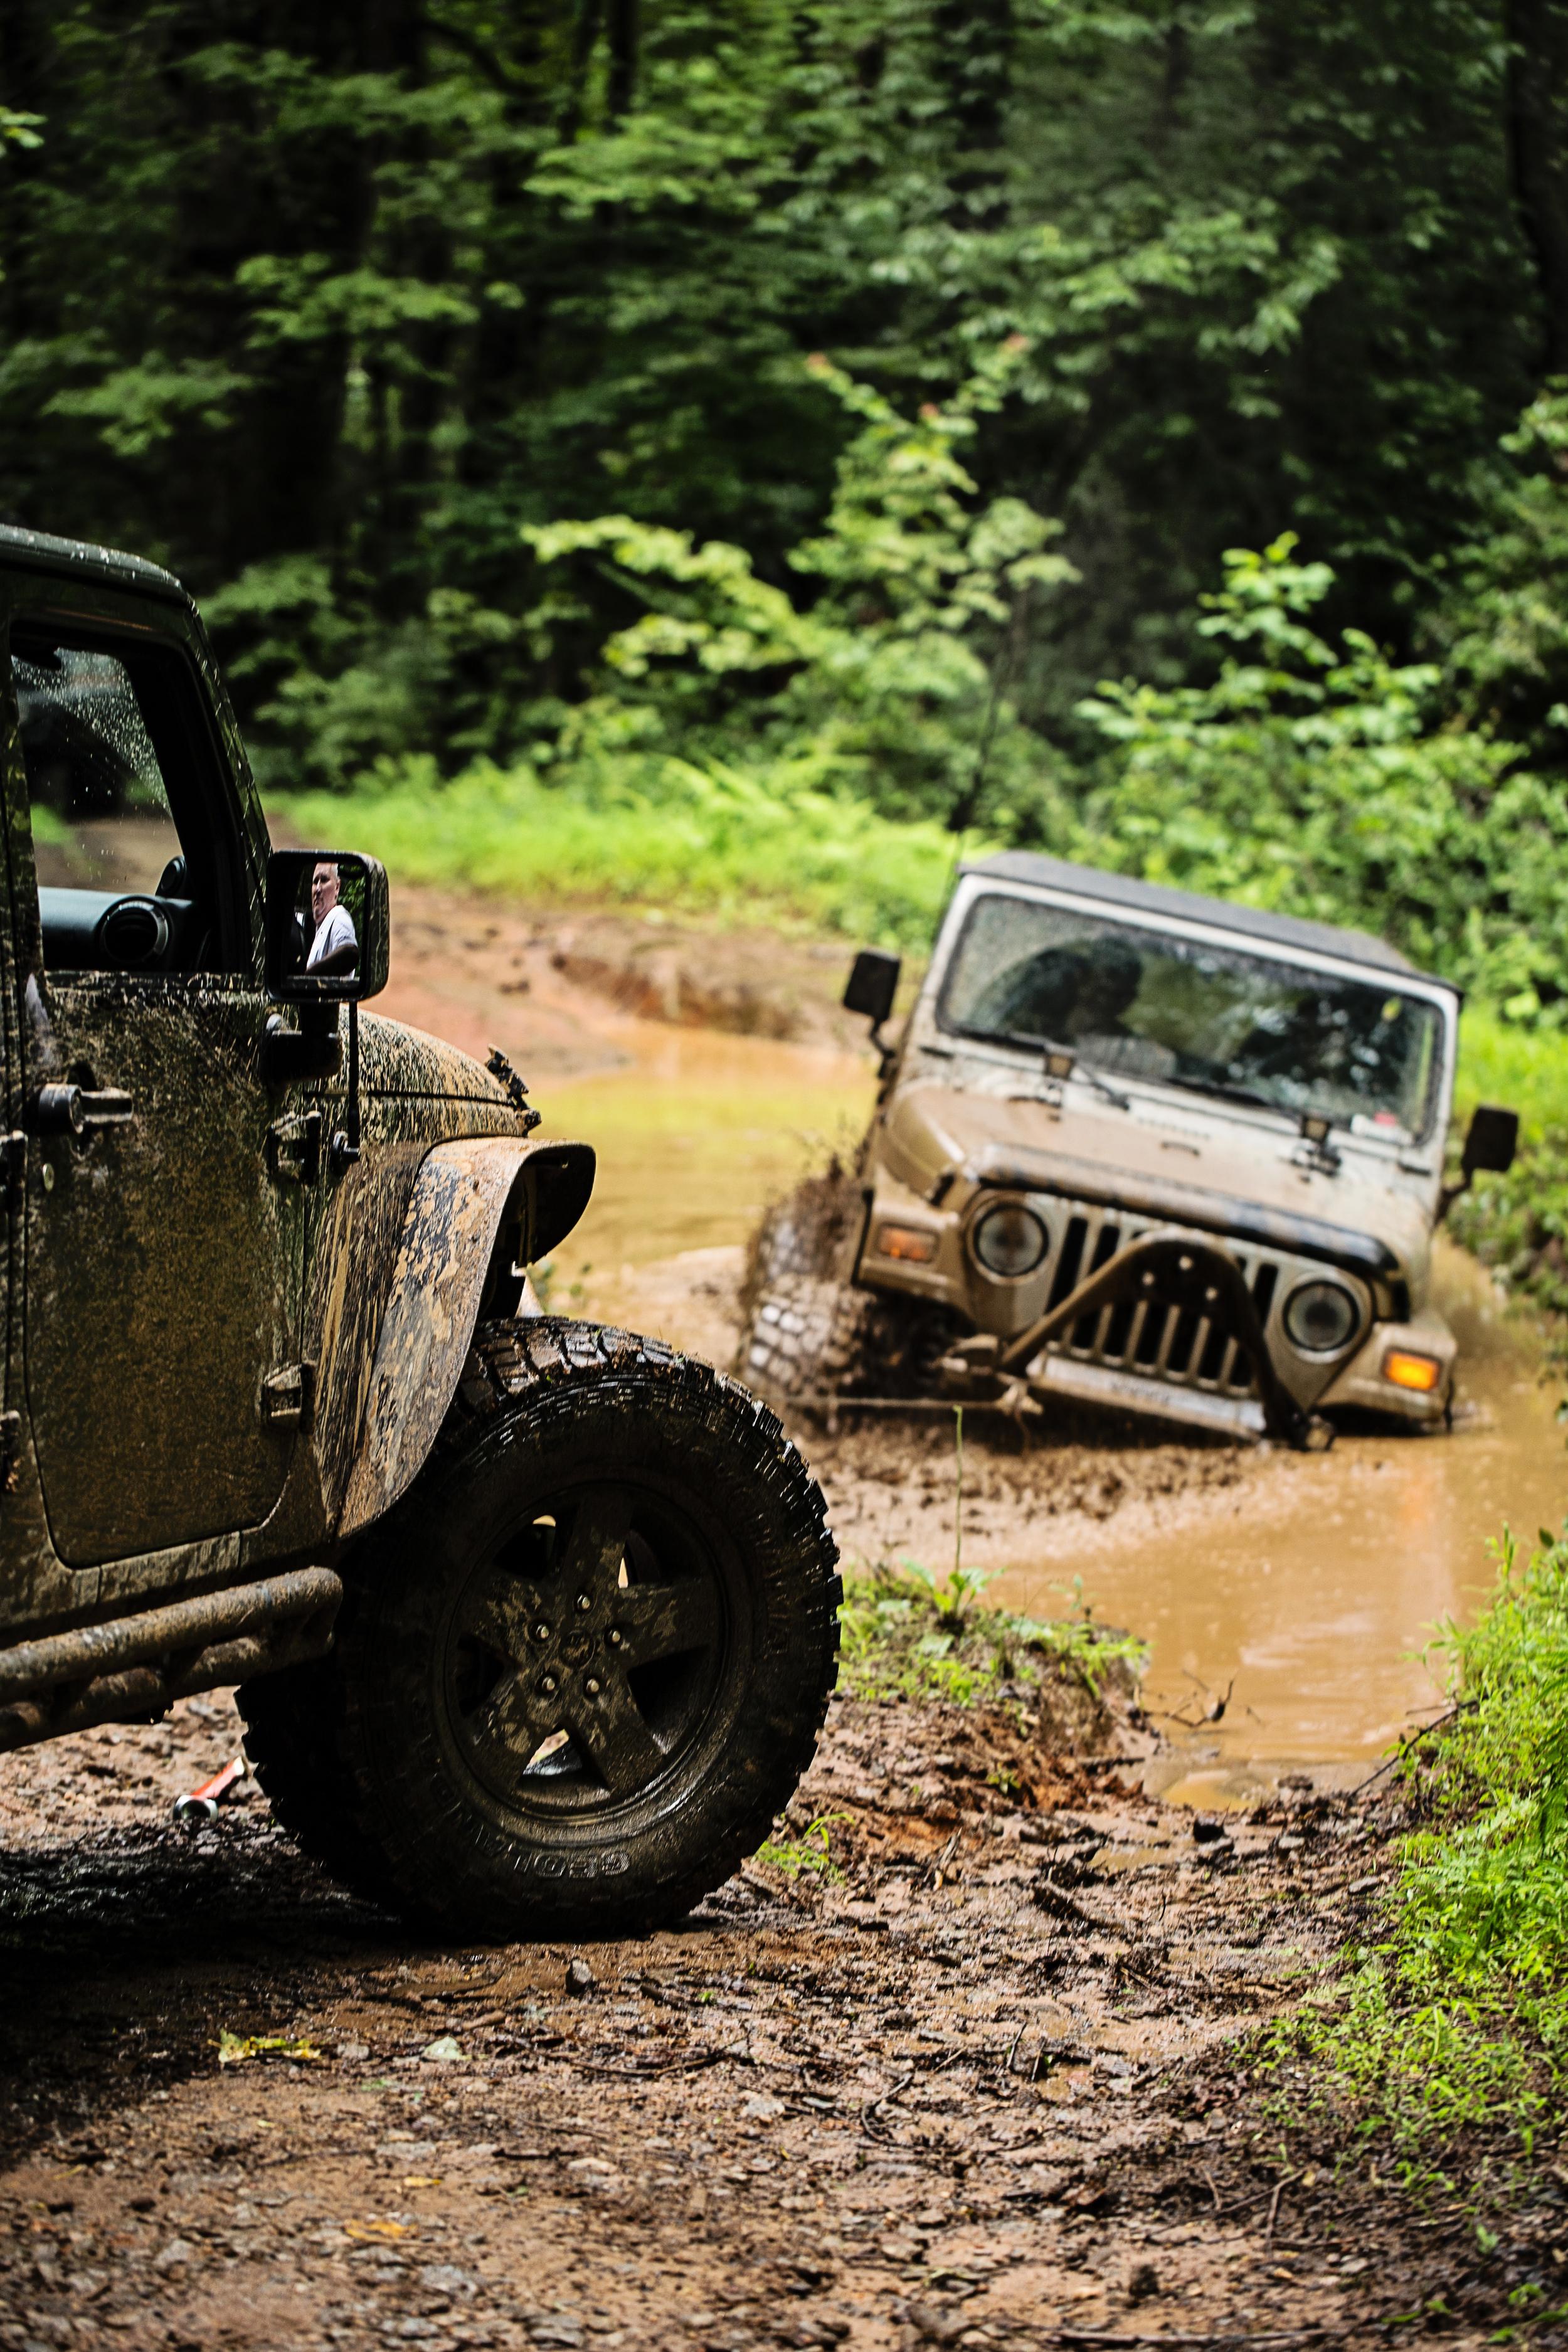 Trail: Warwoman, Rabun County - Northeast Georgia Group: PTR (Piedmont Trail Riders) Photographer: Jen Rigs: Cori M & Tyler H